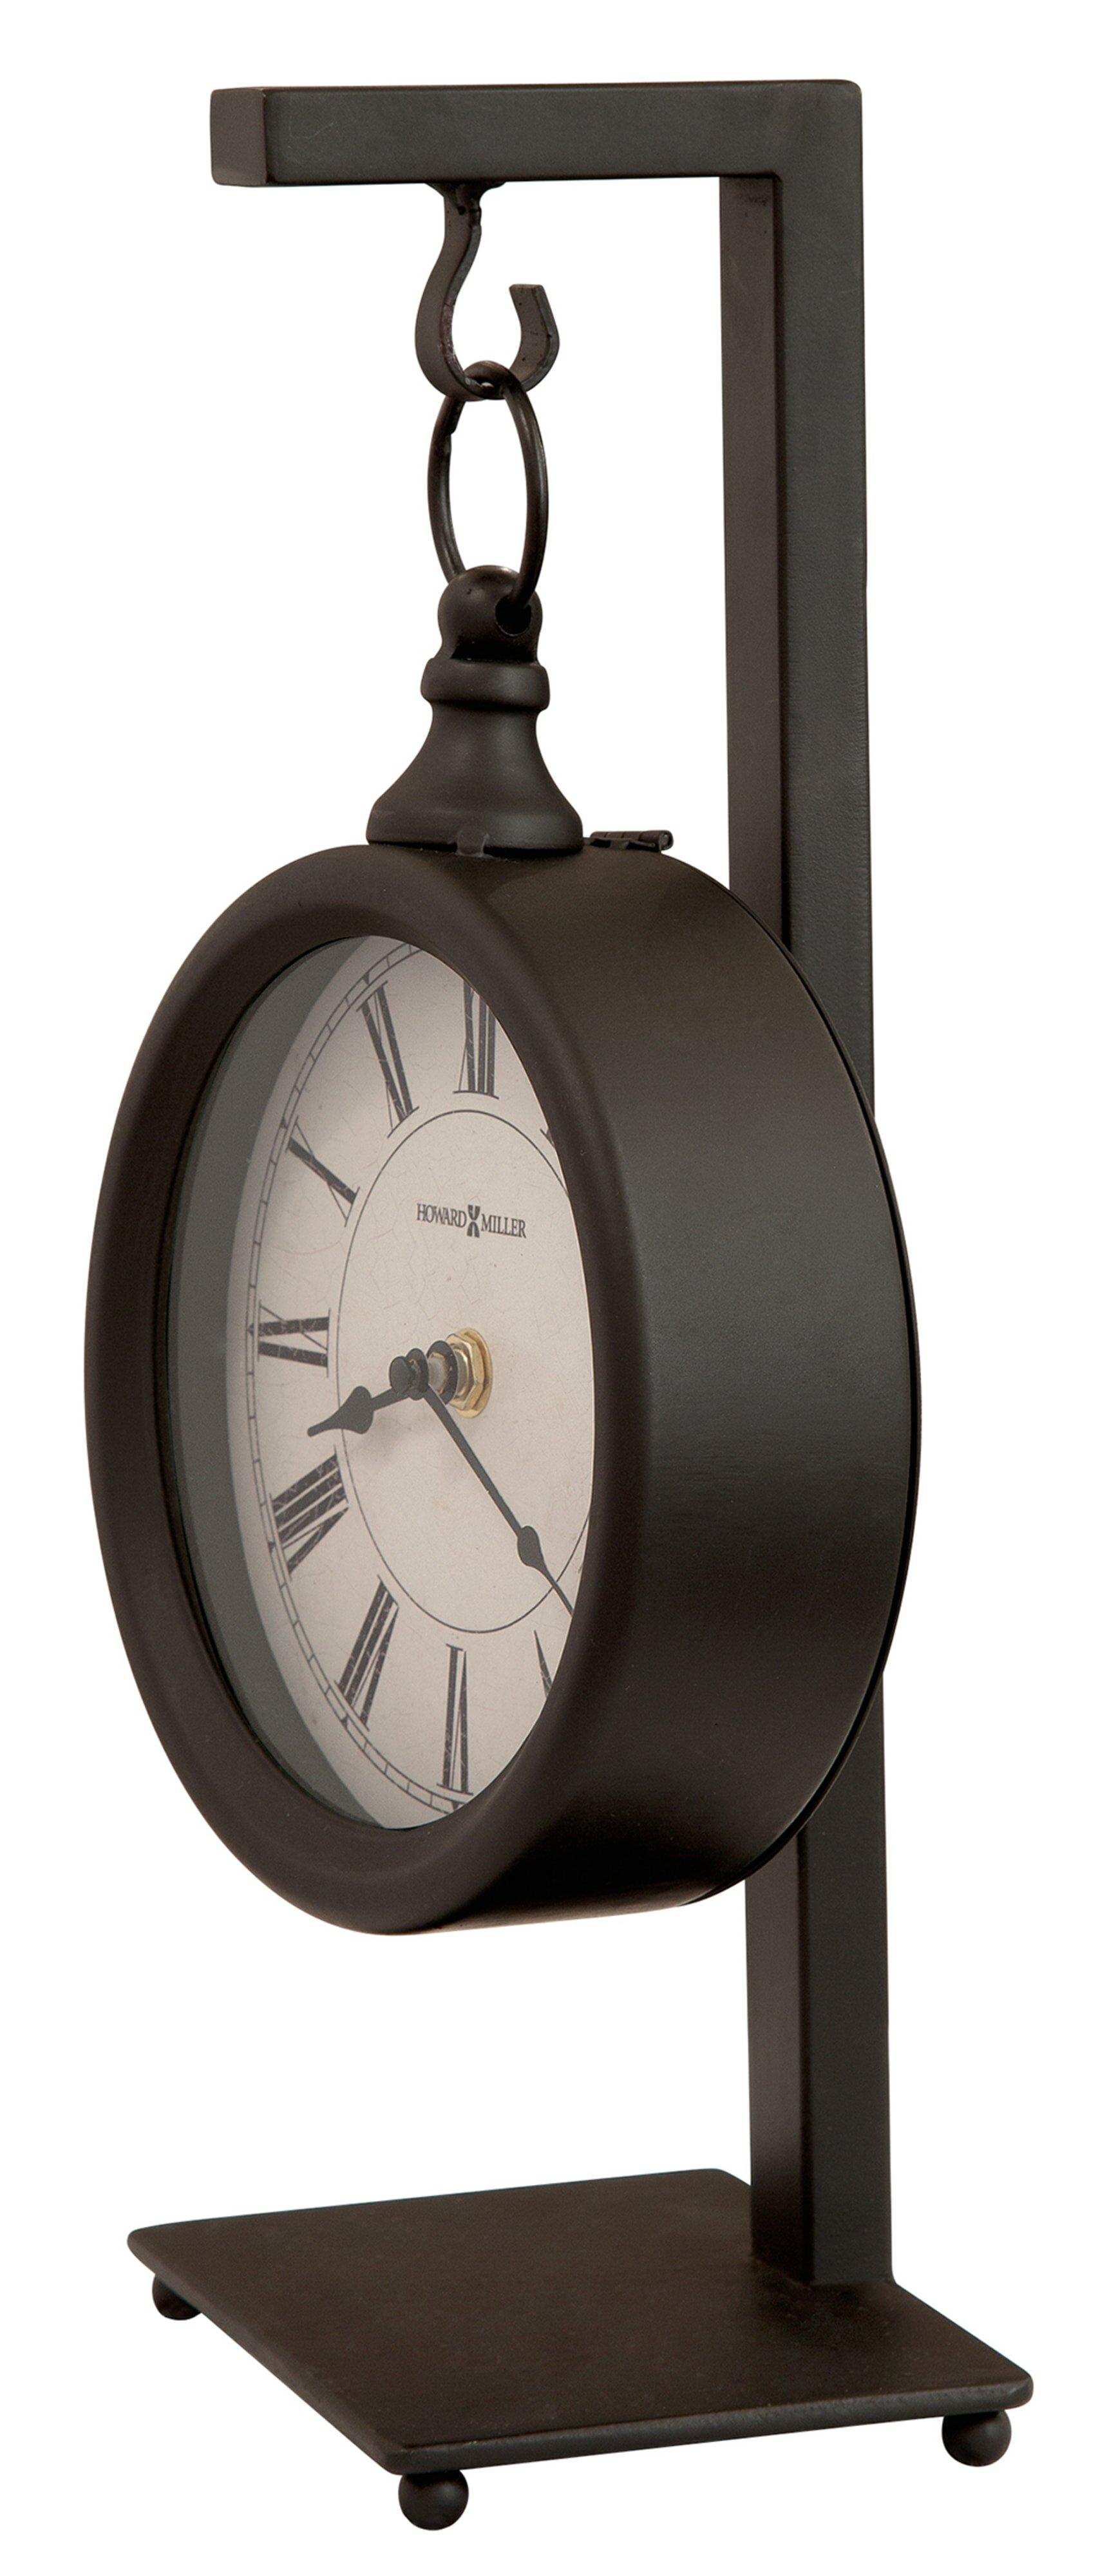 Howard Miller Loman Tabletop Clock Reviews Wayfair